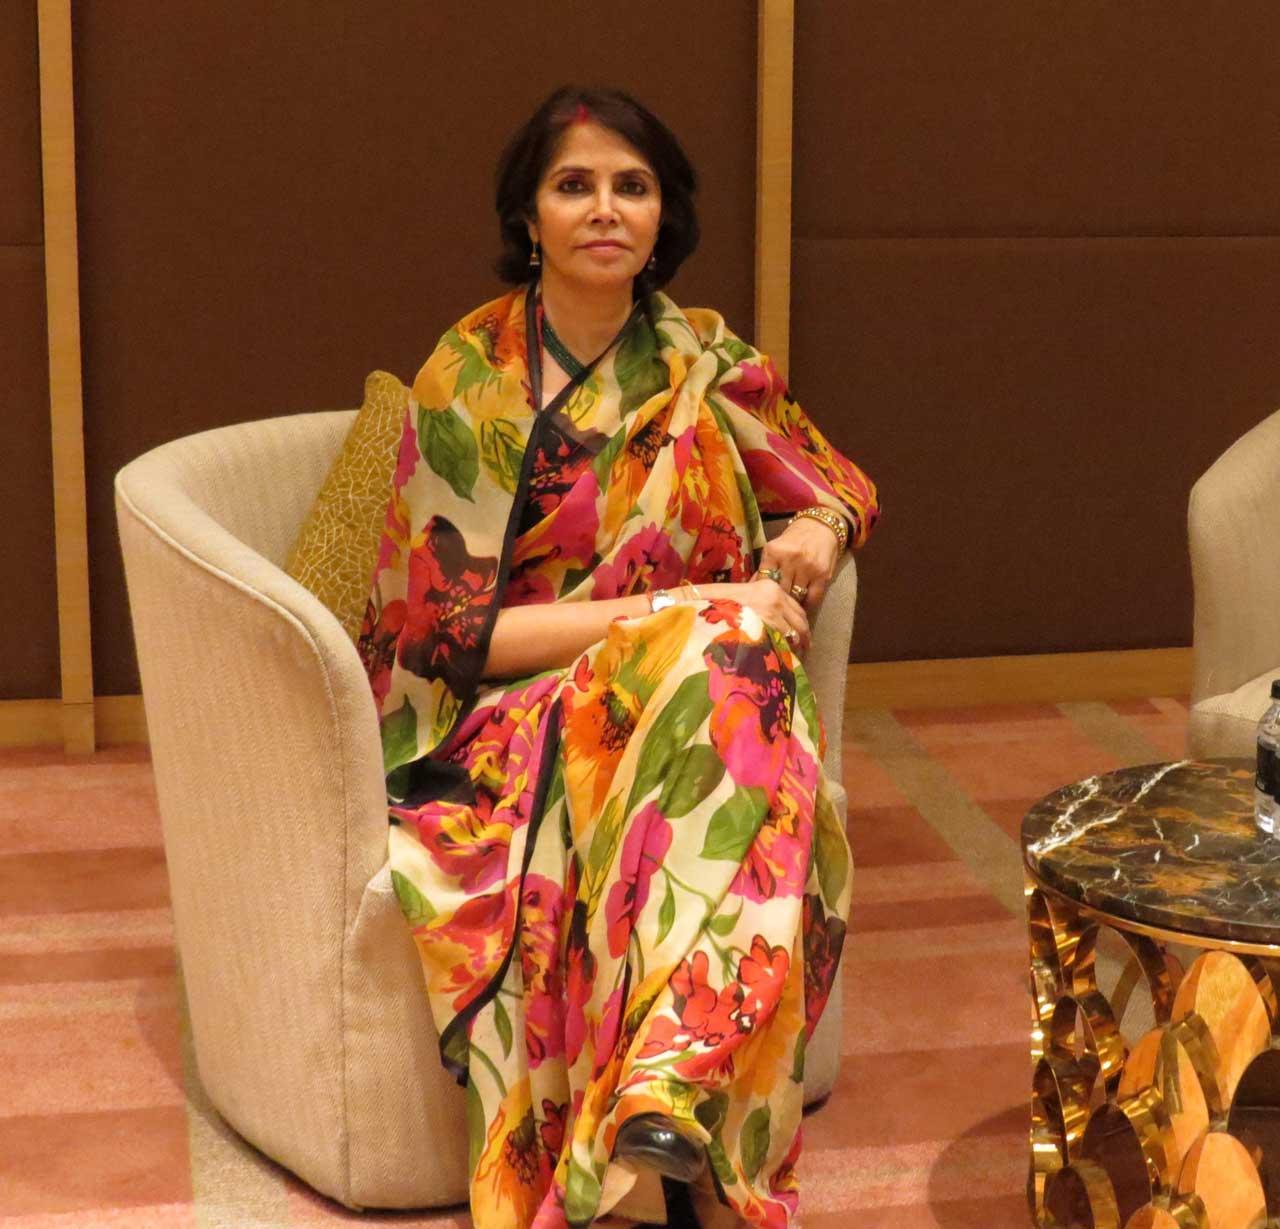 Ehsaas-woman-of-Lucknow,-Kanak-Rekha-Chauhan-Conversationalist